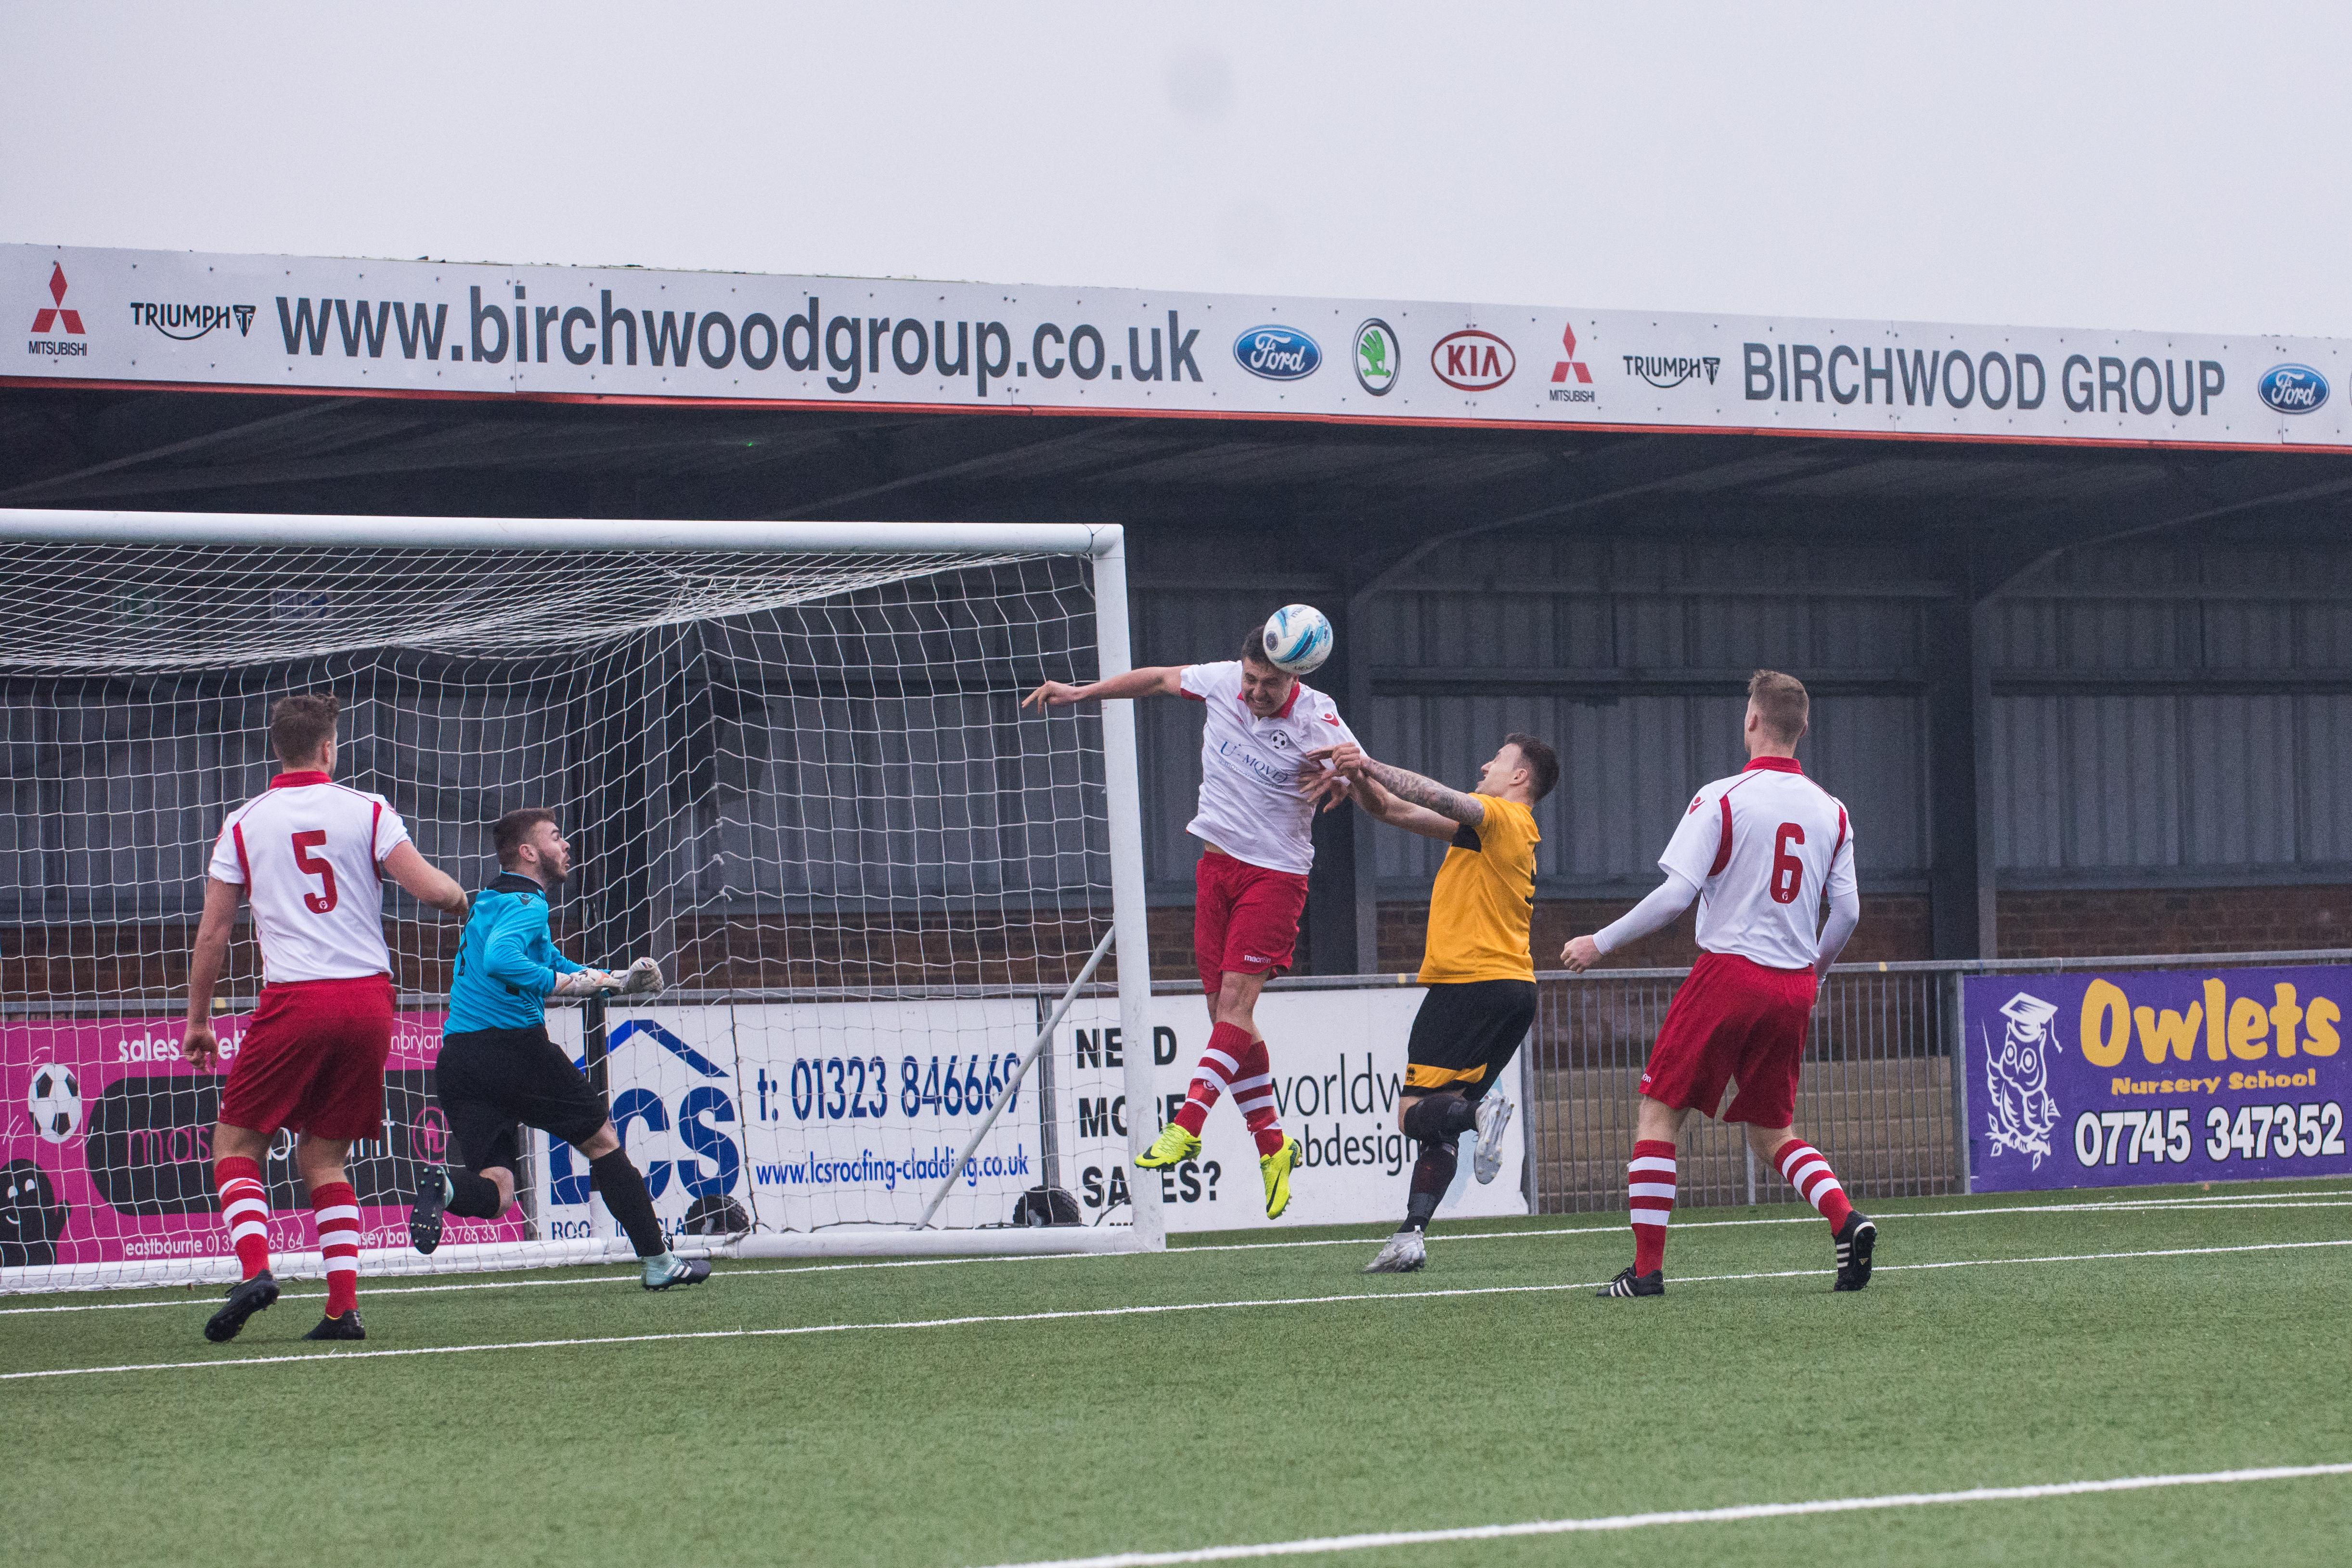 DAVID_JEFFERY Langney Wanderers FC vs Bexhill United FC 03.03.18 62